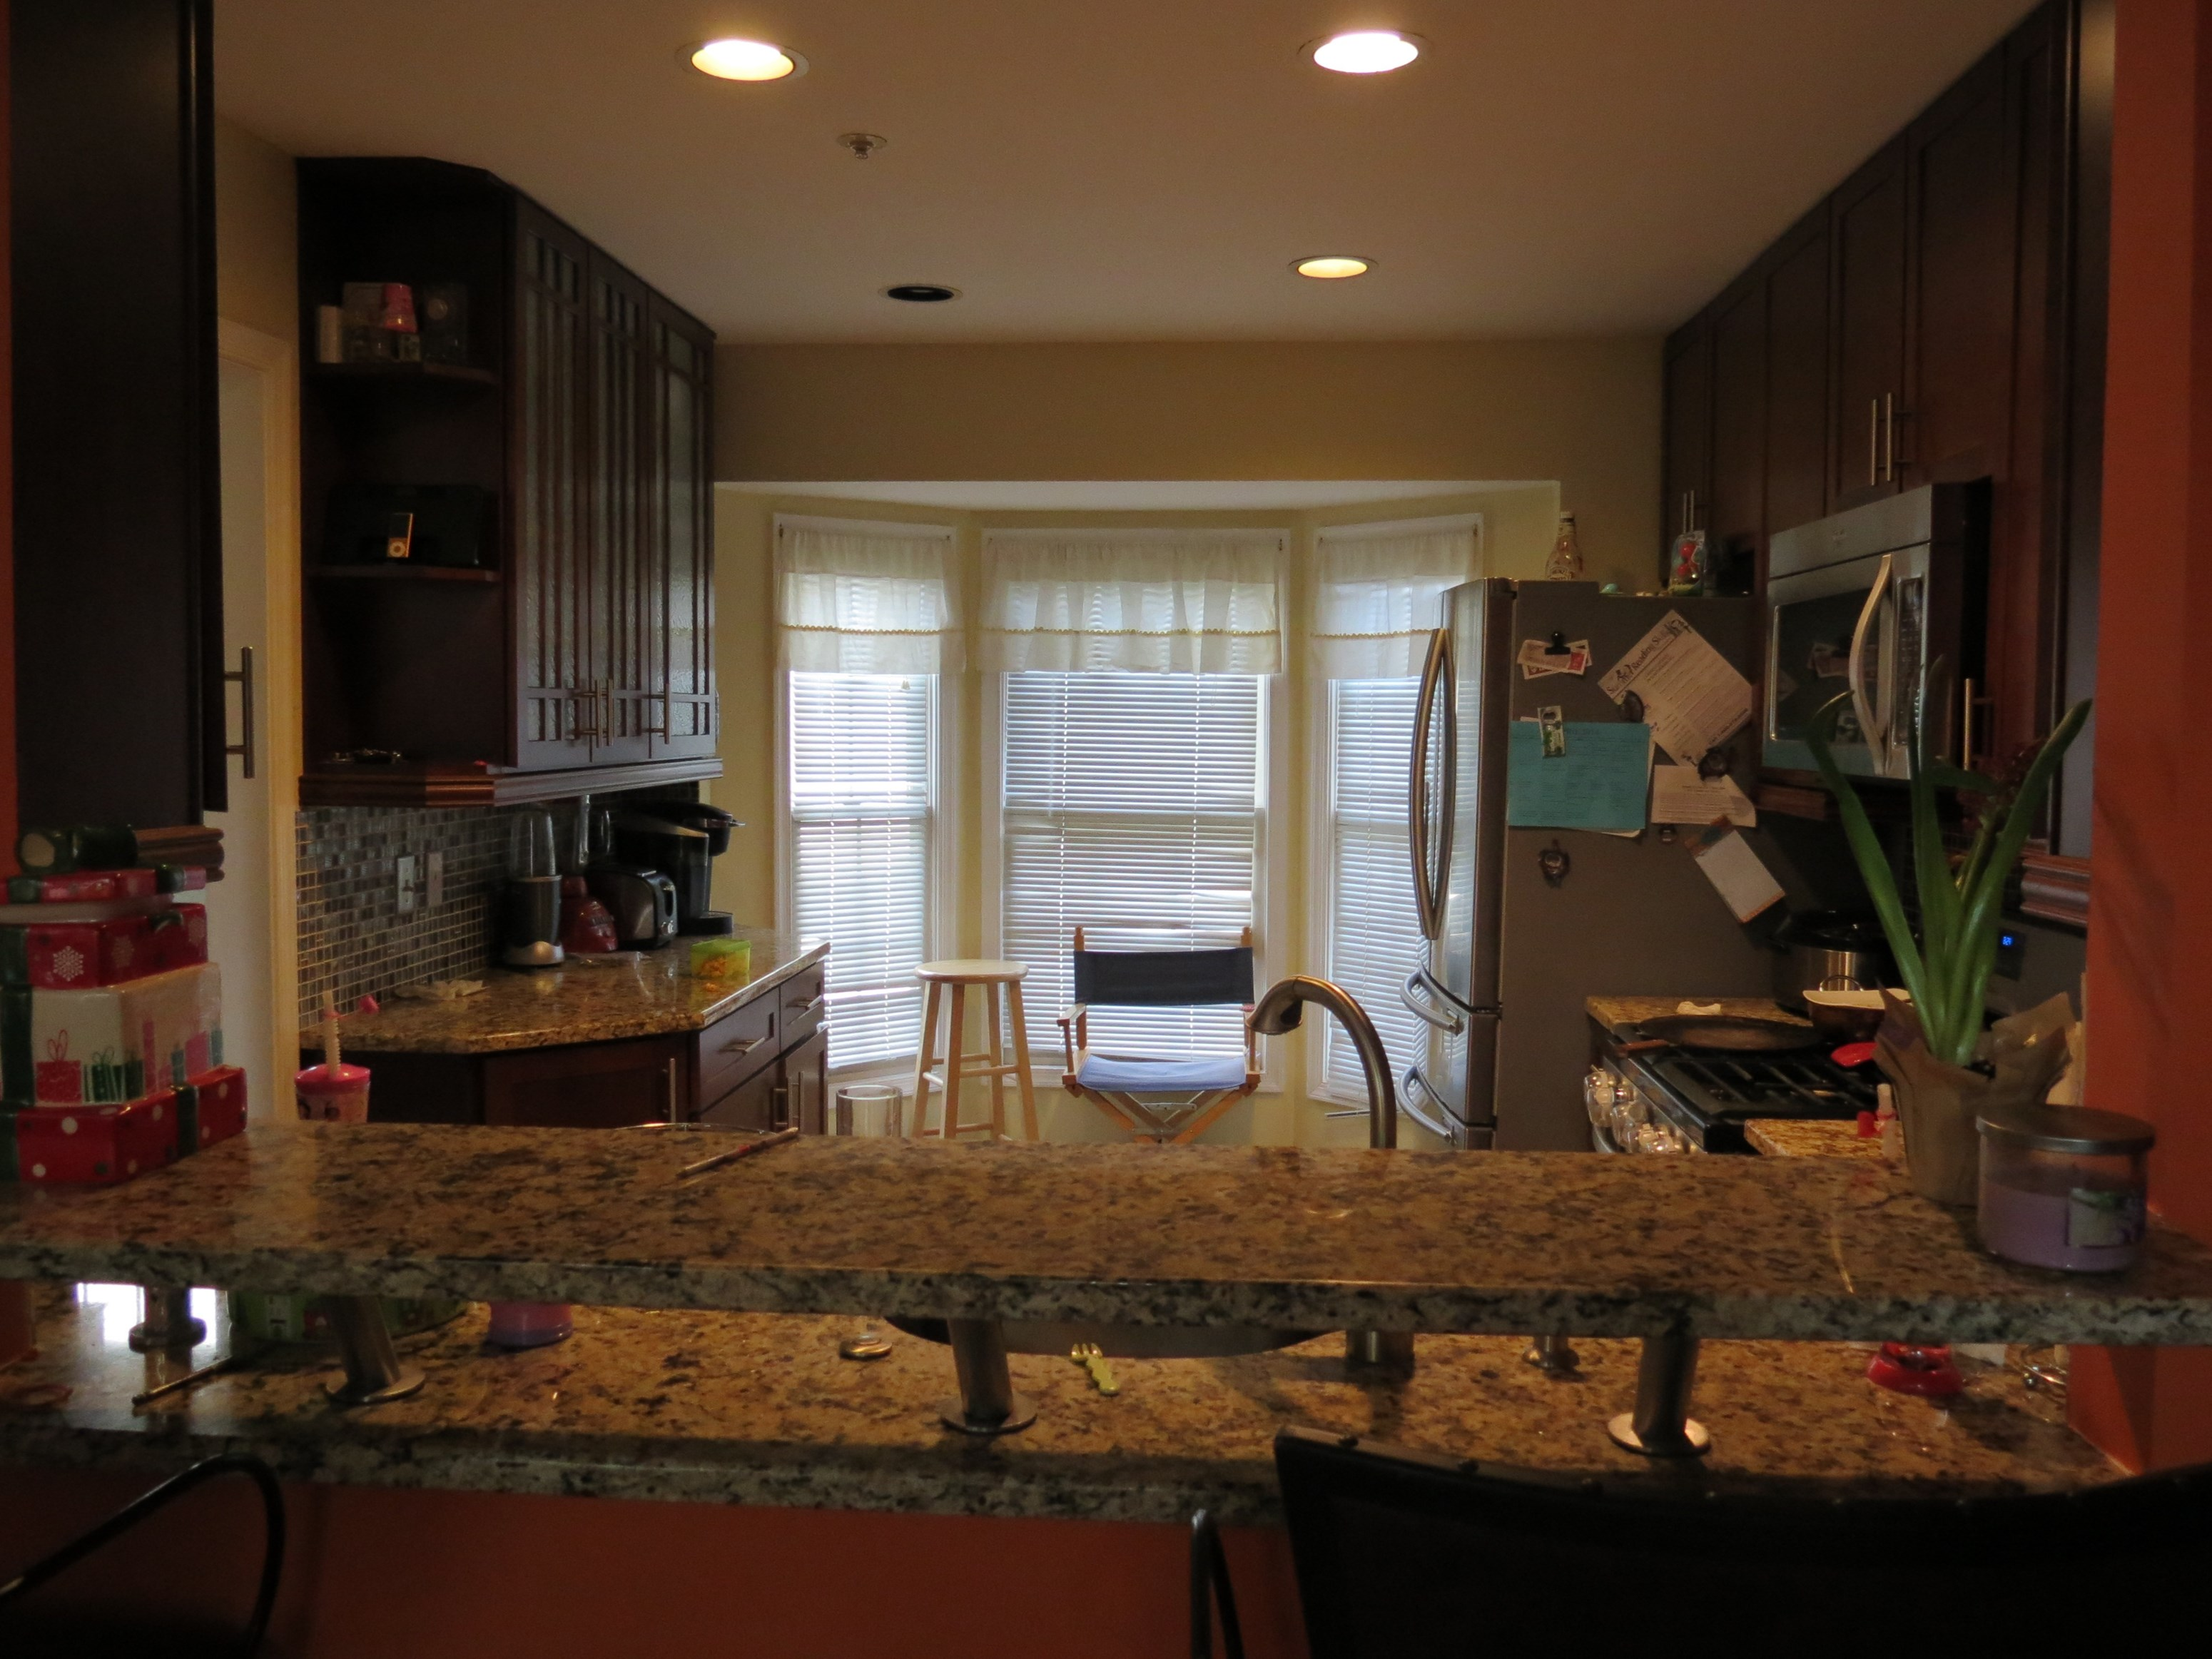 basement apt for rent 1 bhk in reston va 813664 sulekha rentals